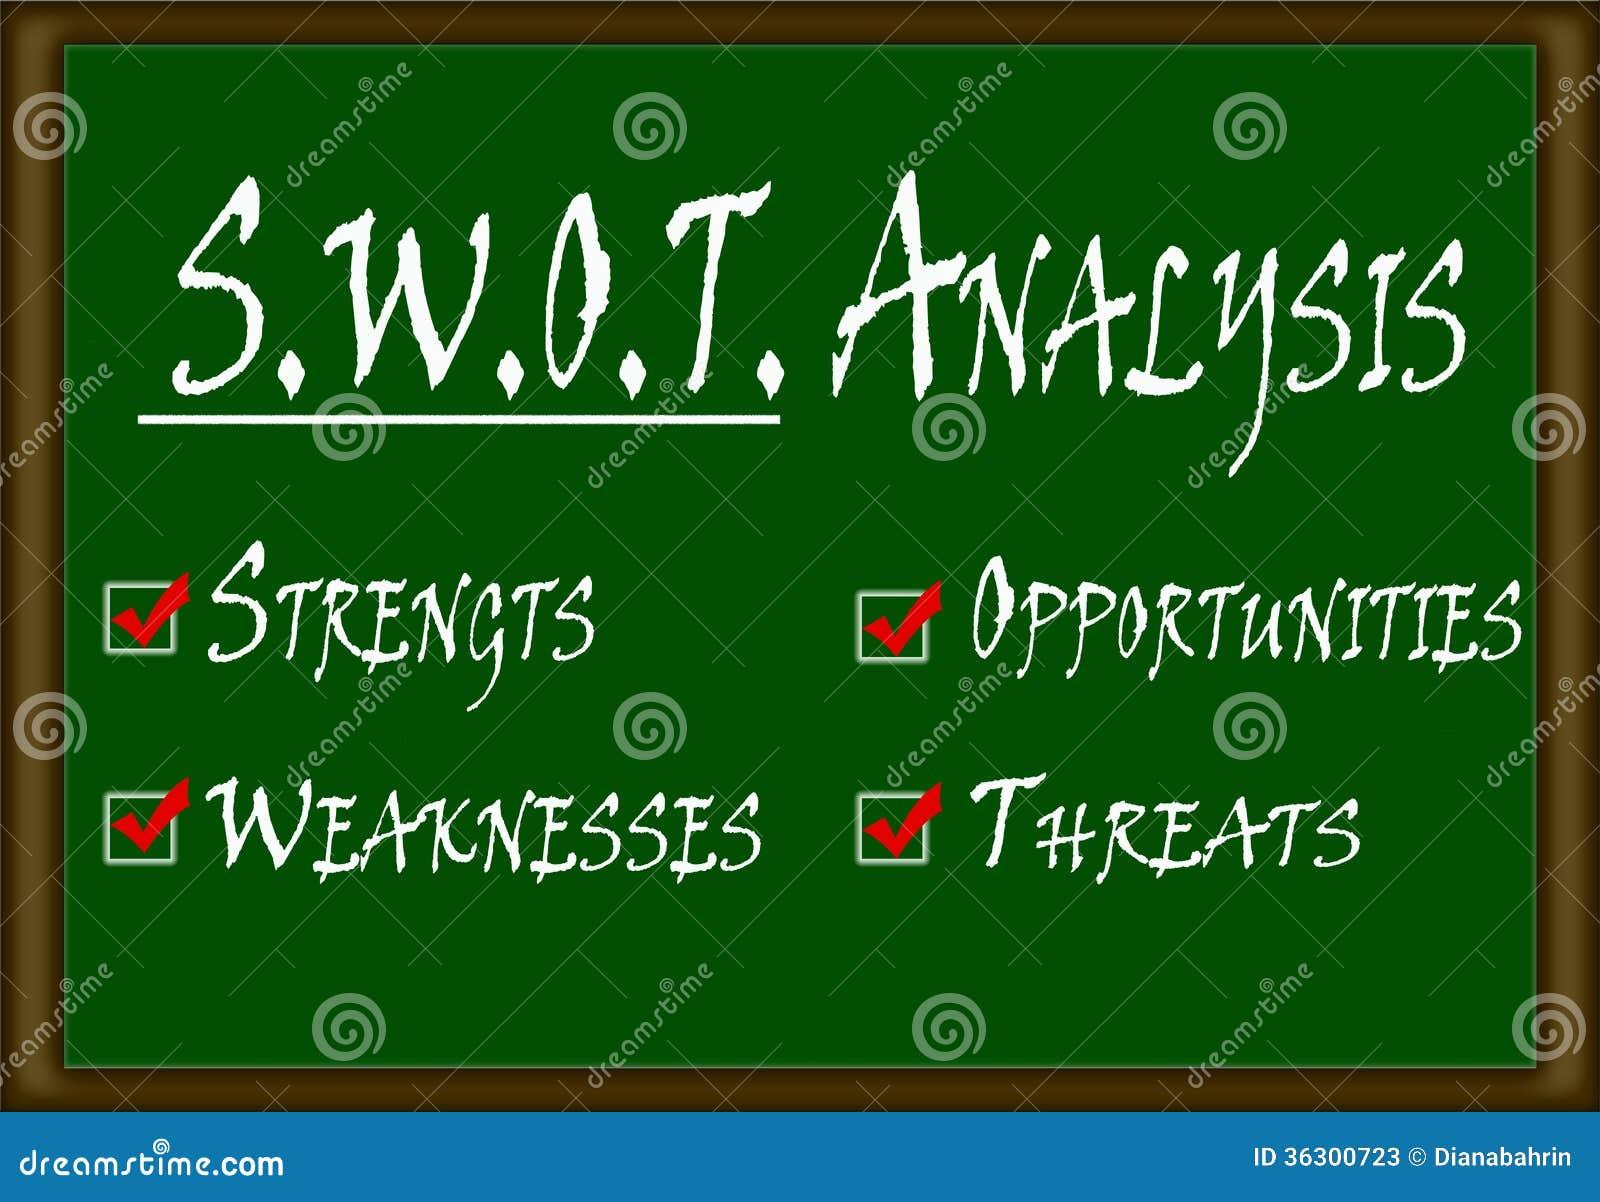 Swot analysis going green